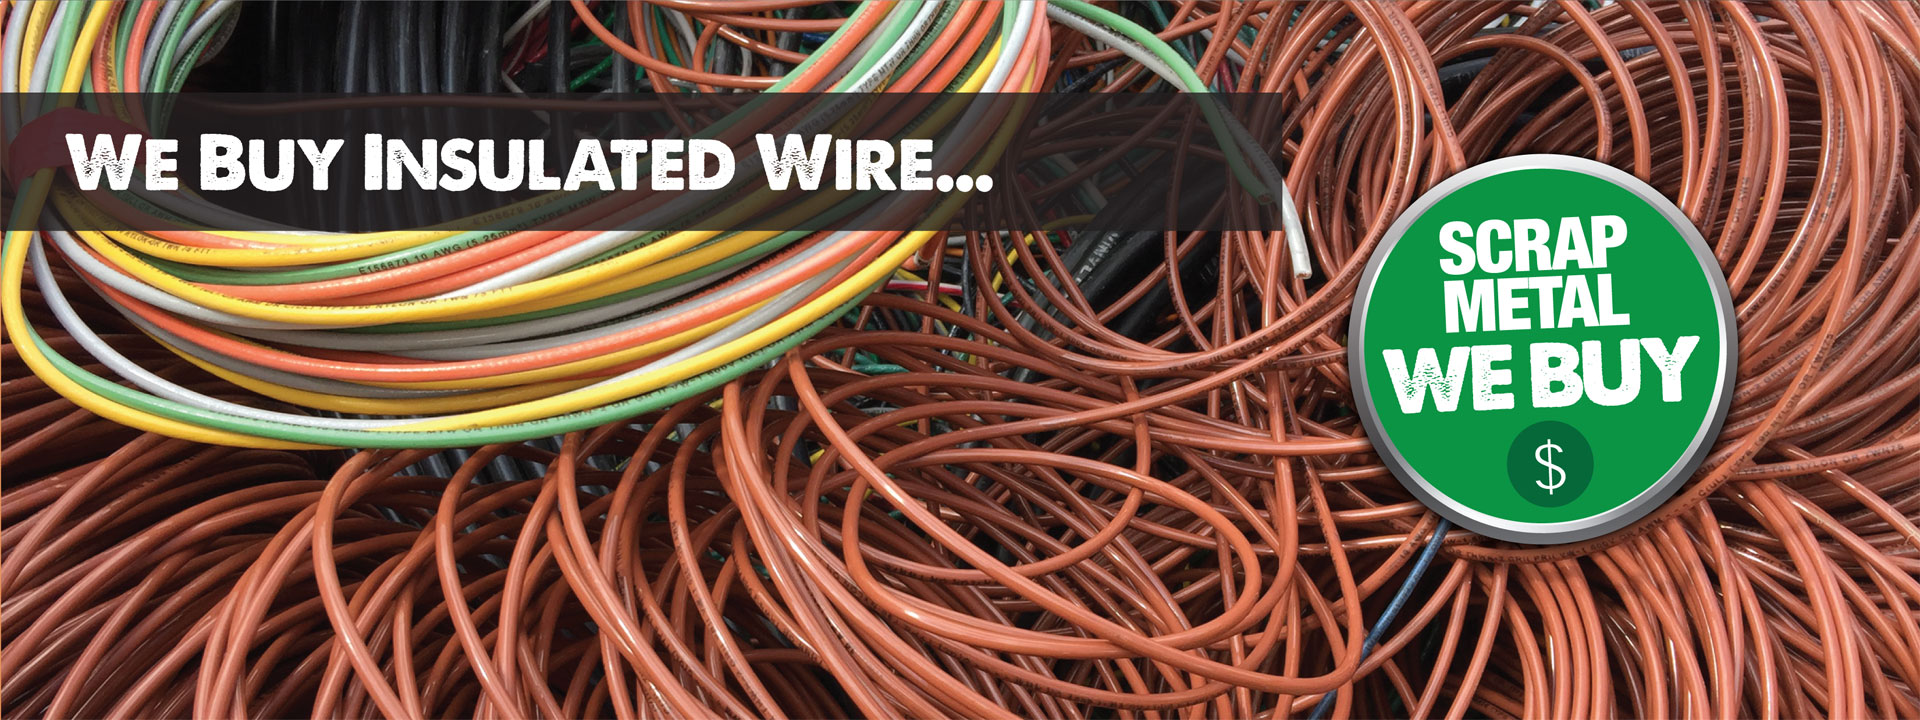 Insulated Wire - Astro City Scrap Metal